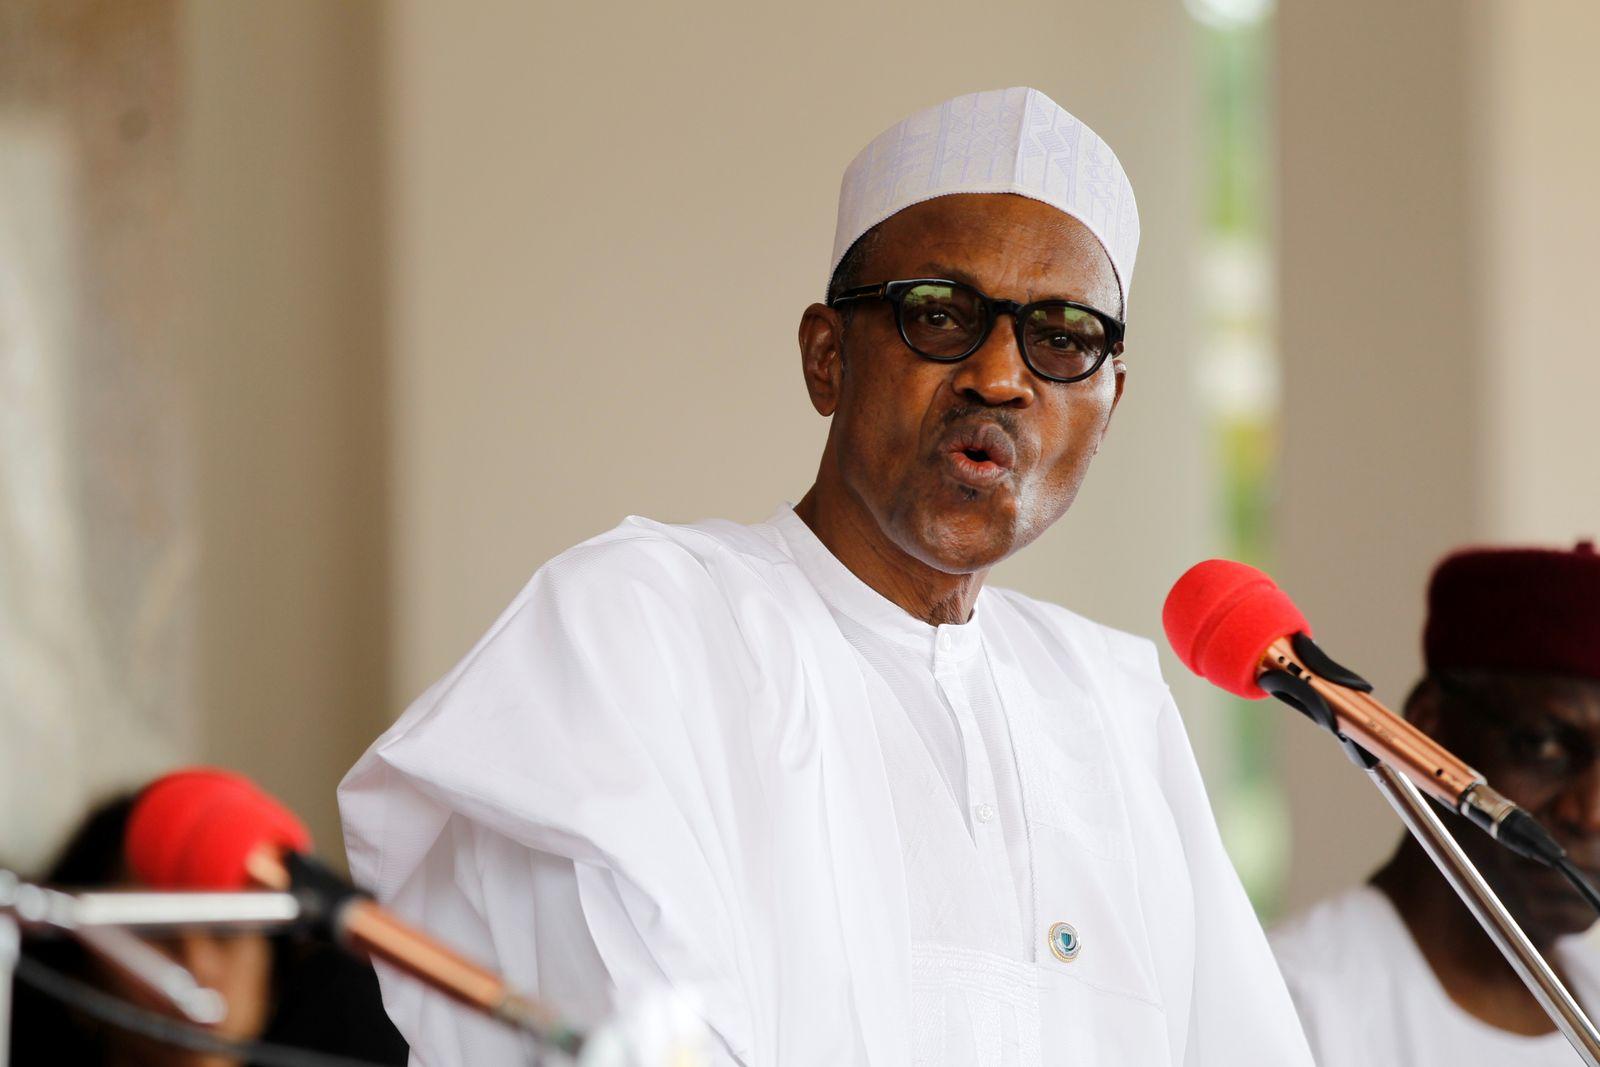 Muhammadu Buhari / Nigeria